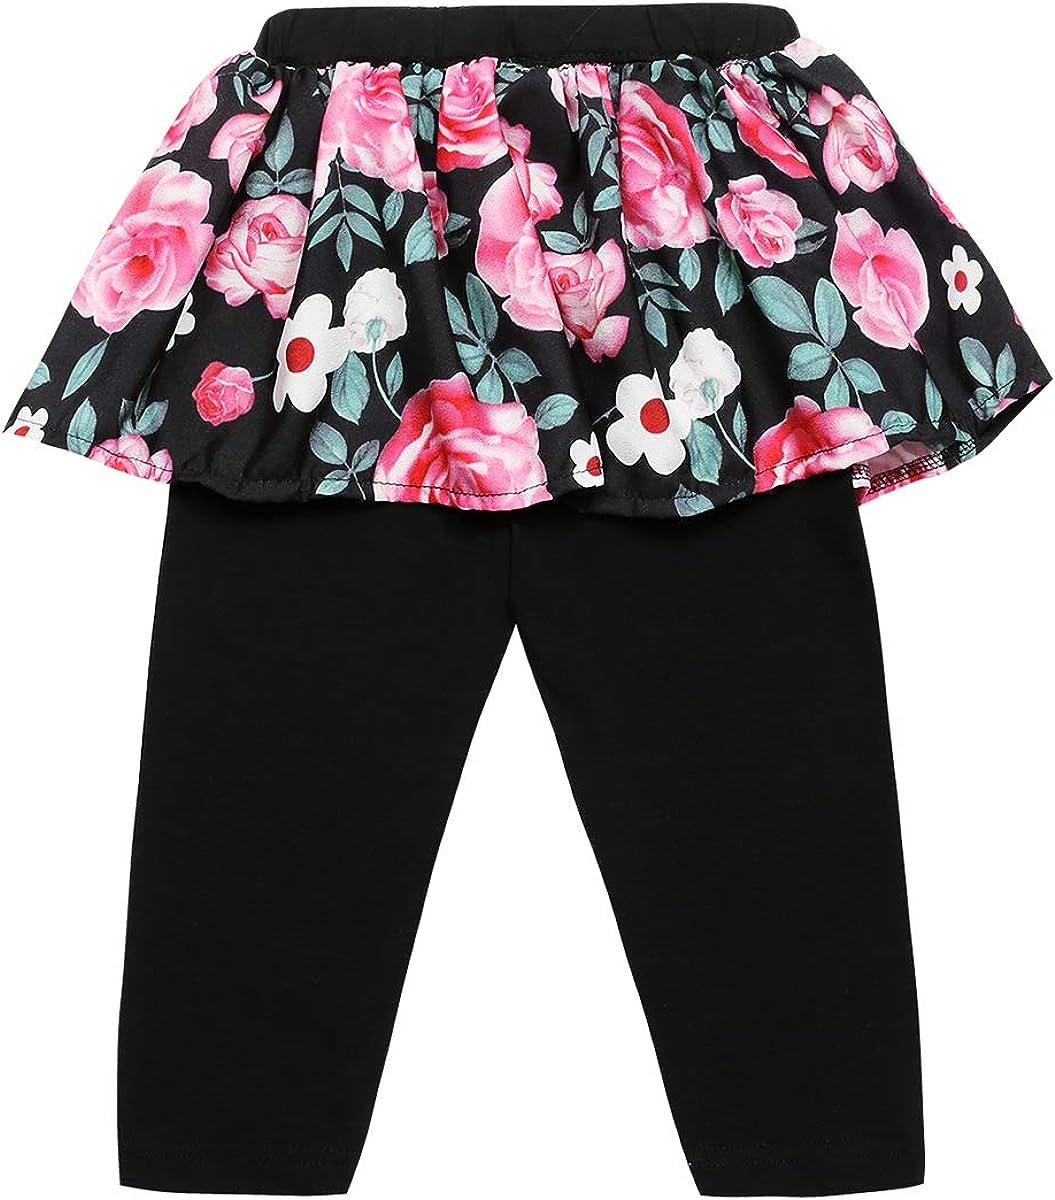 3PCS Baby Girls Outfit Clothes Set Floral Vest Shorts Headband